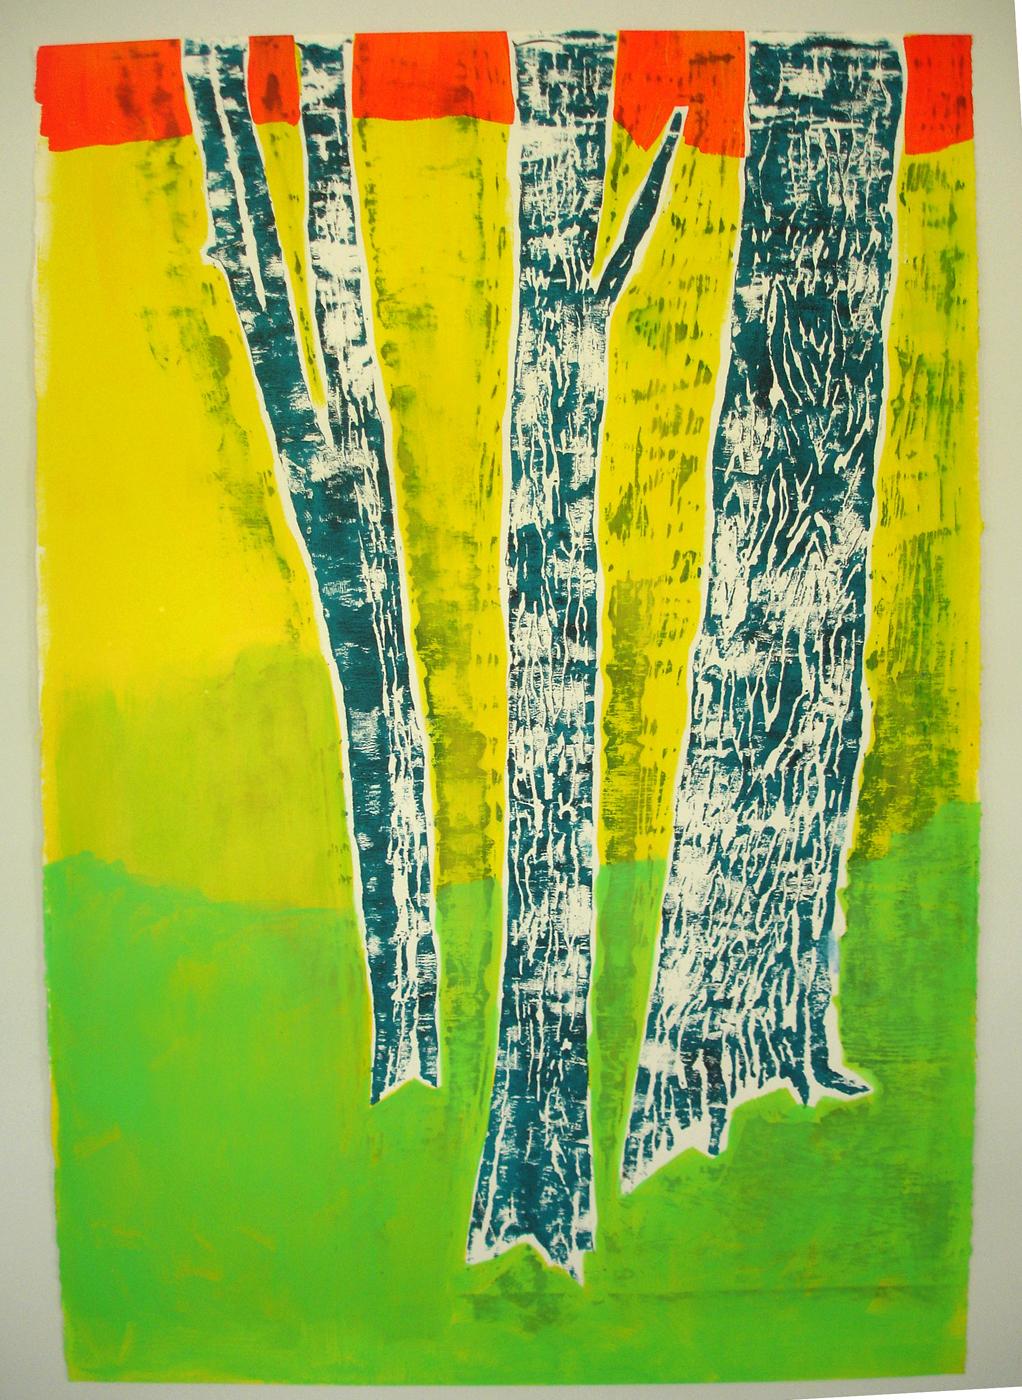 Meghan Gerety  Orange, Yellow, Green Trees , 2012 blockprint ink on paper 32 x 22 in.framed